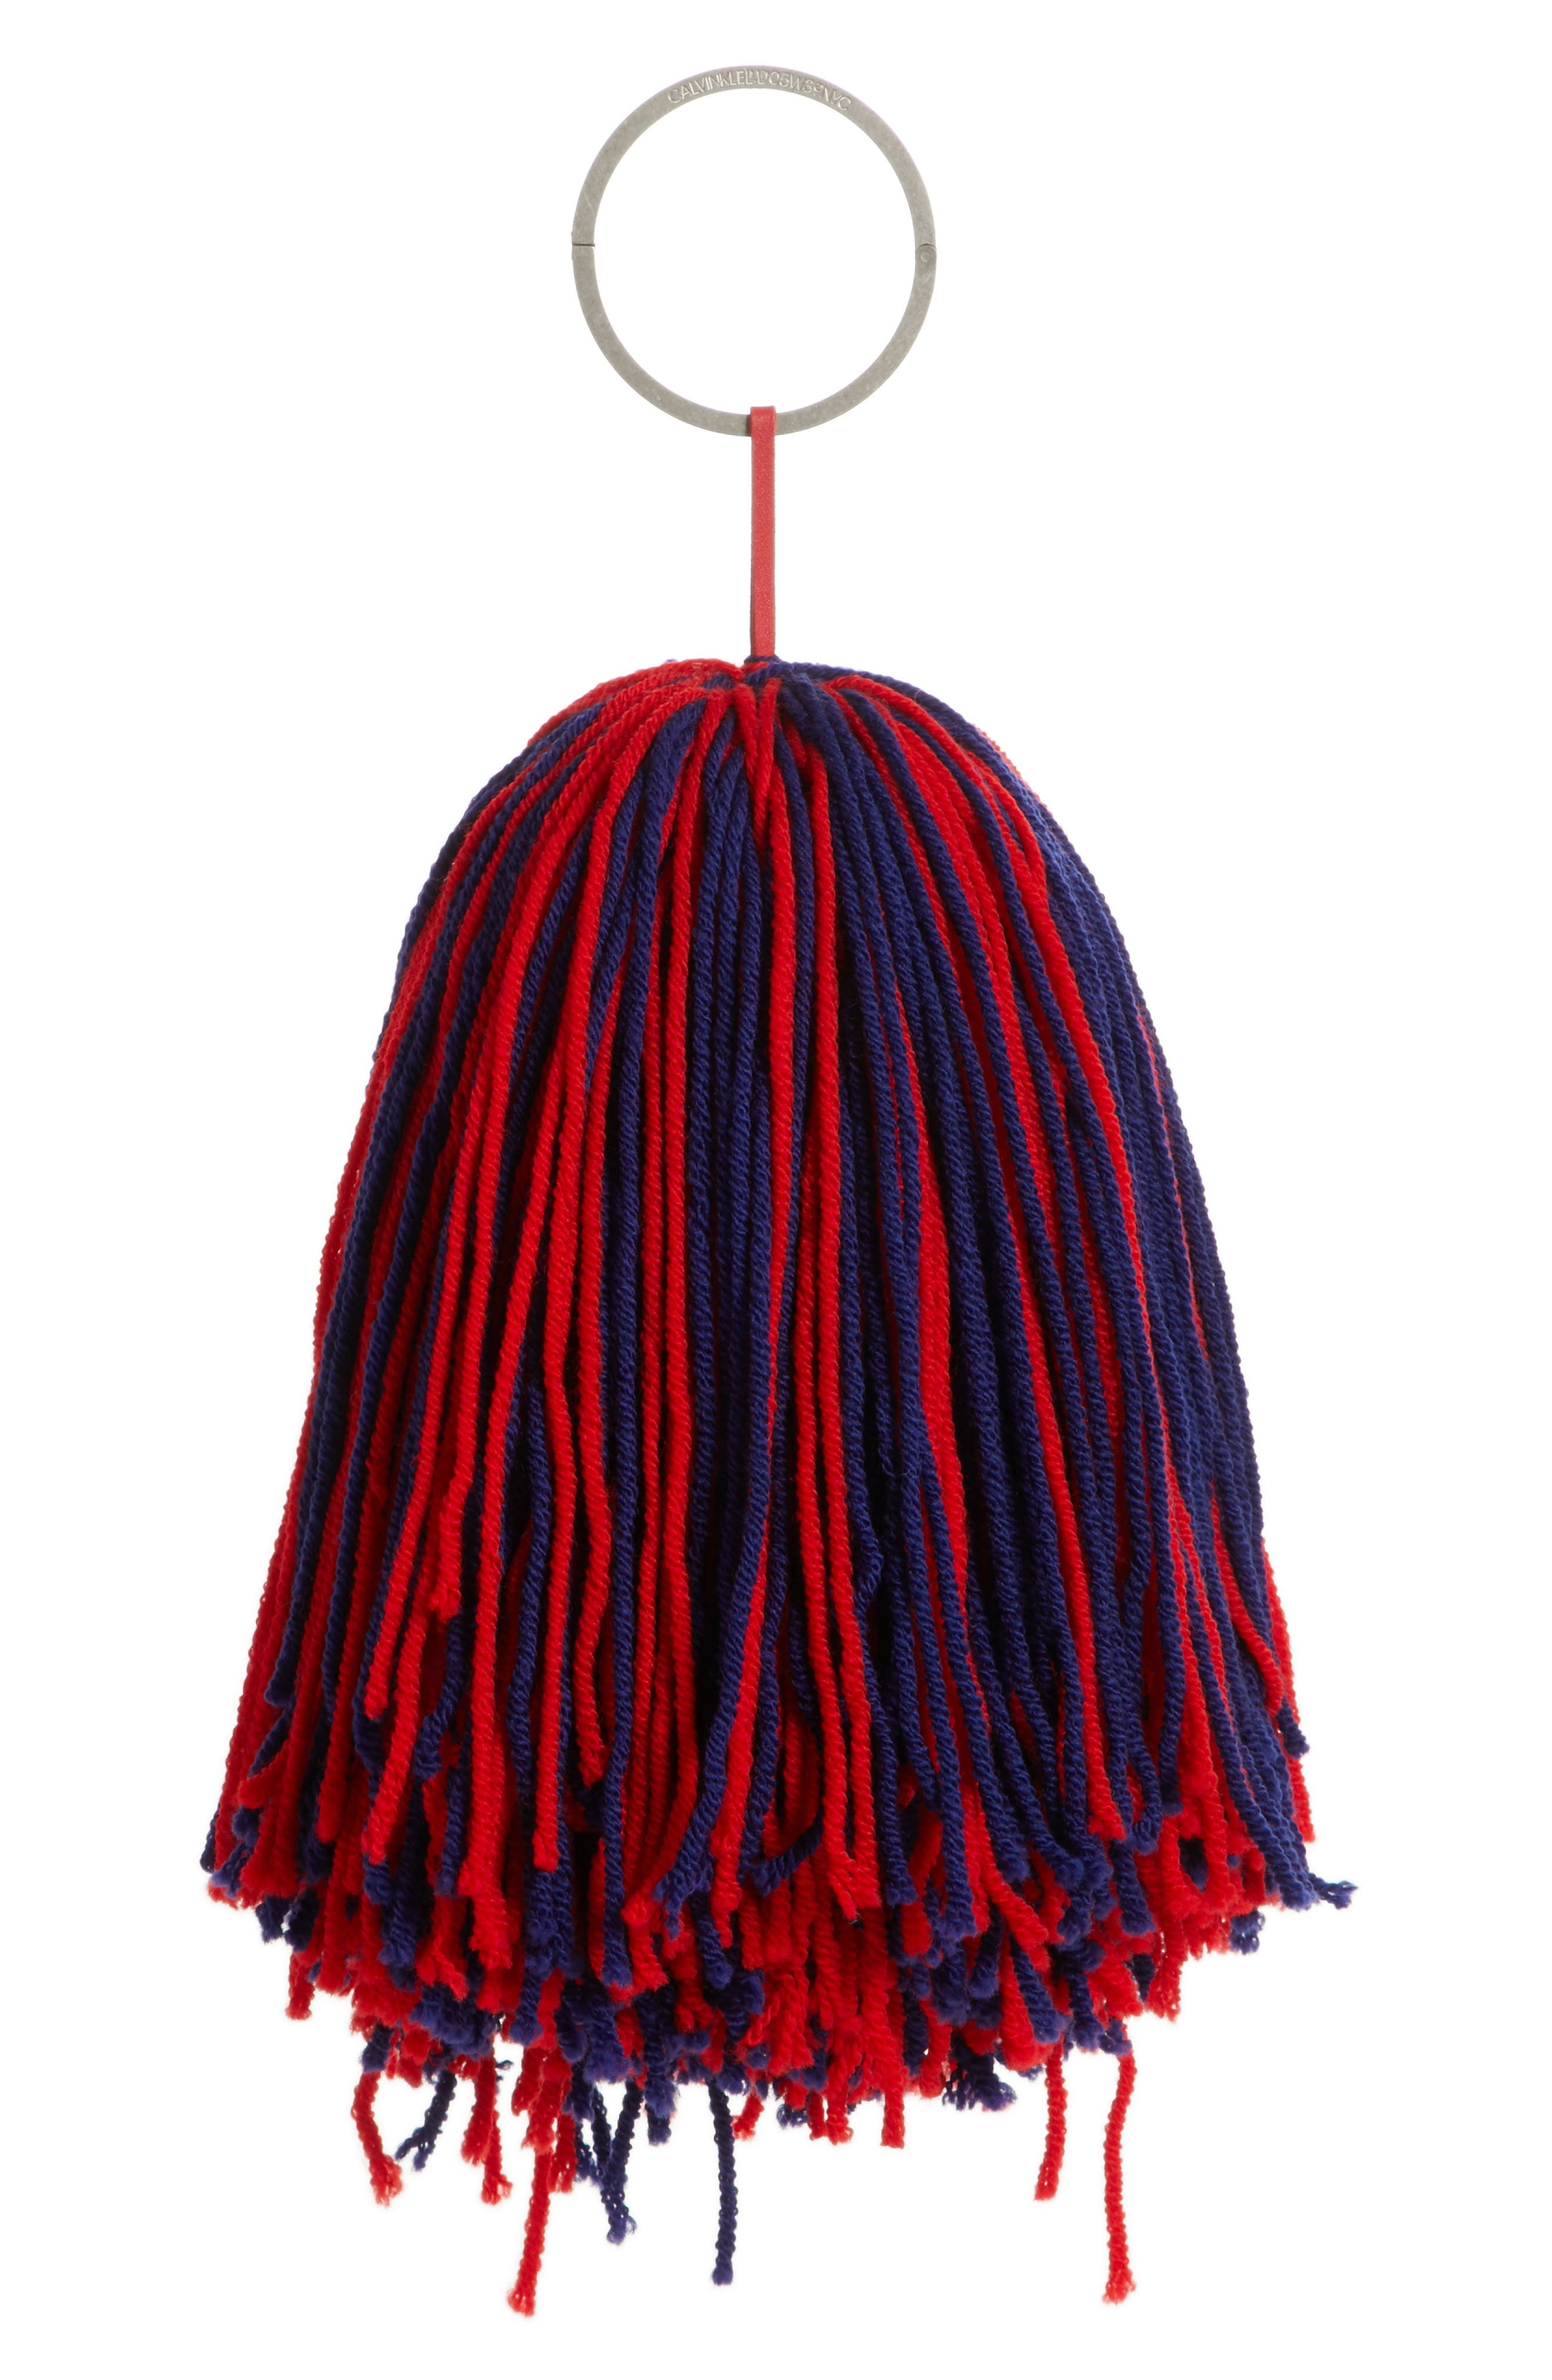 Pompom Bag Charm,                             Main thumbnail 1, color,                             600